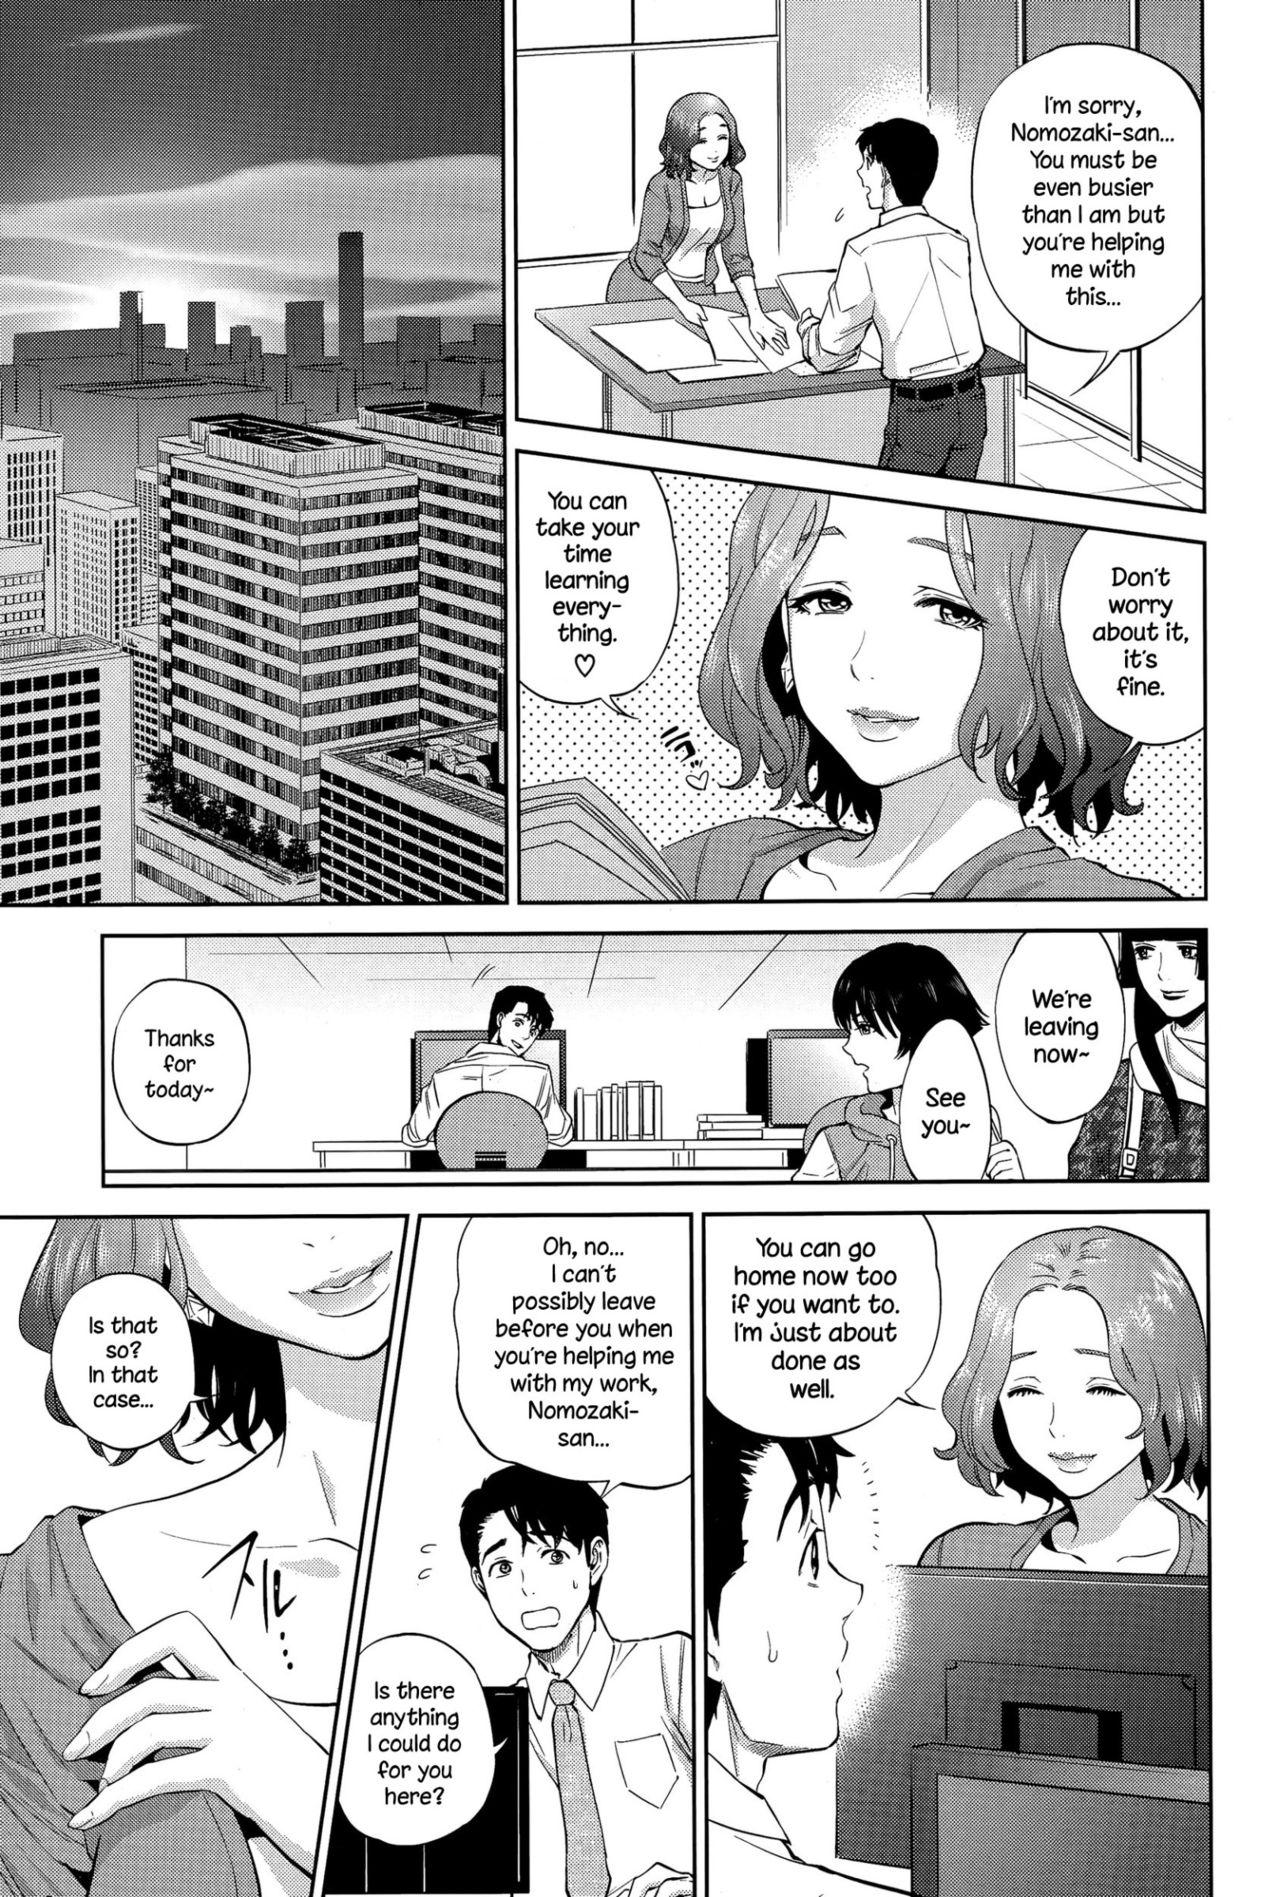 Yuuwaku Office | Office Love Scramble 75